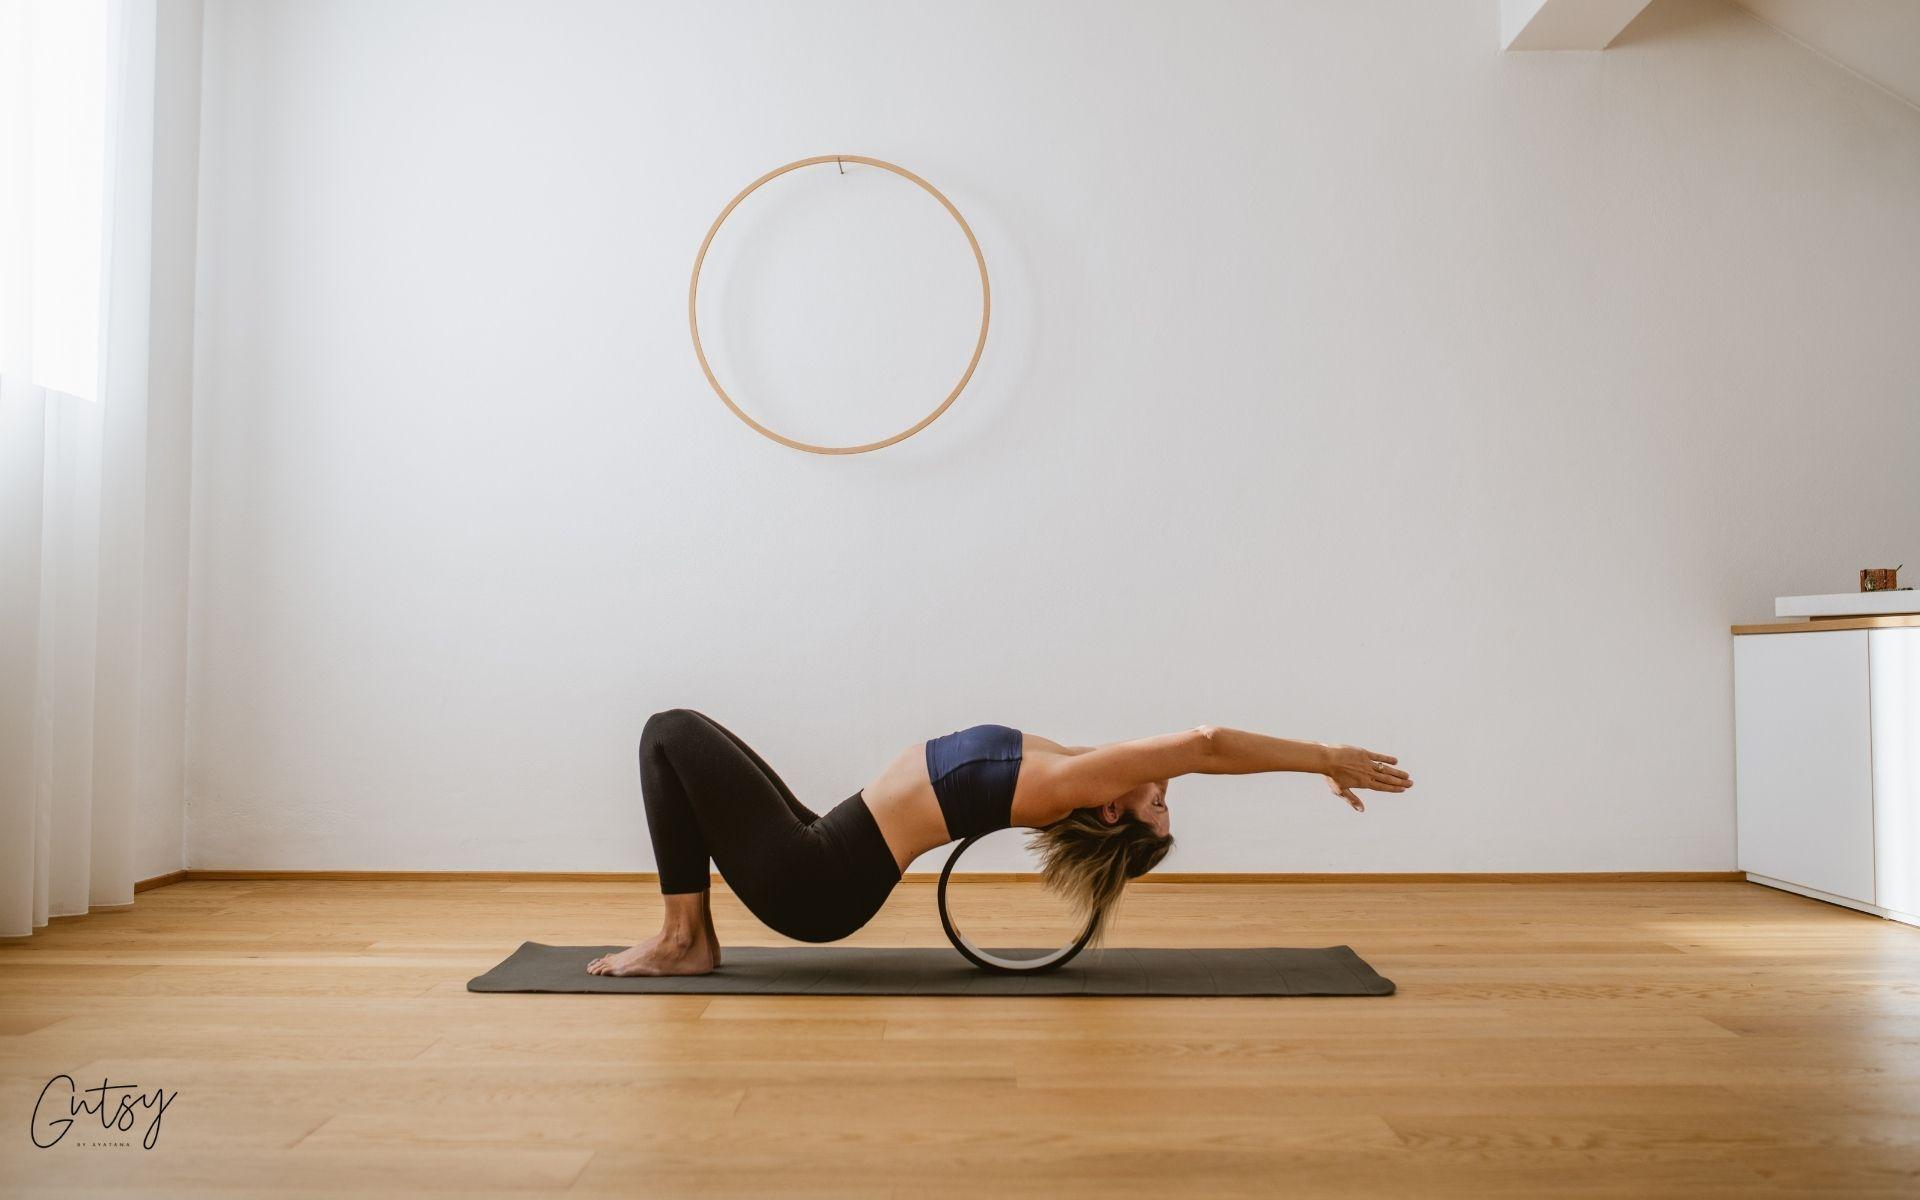 Aleksandra med prakso joge v zaklonu na joga kolesu